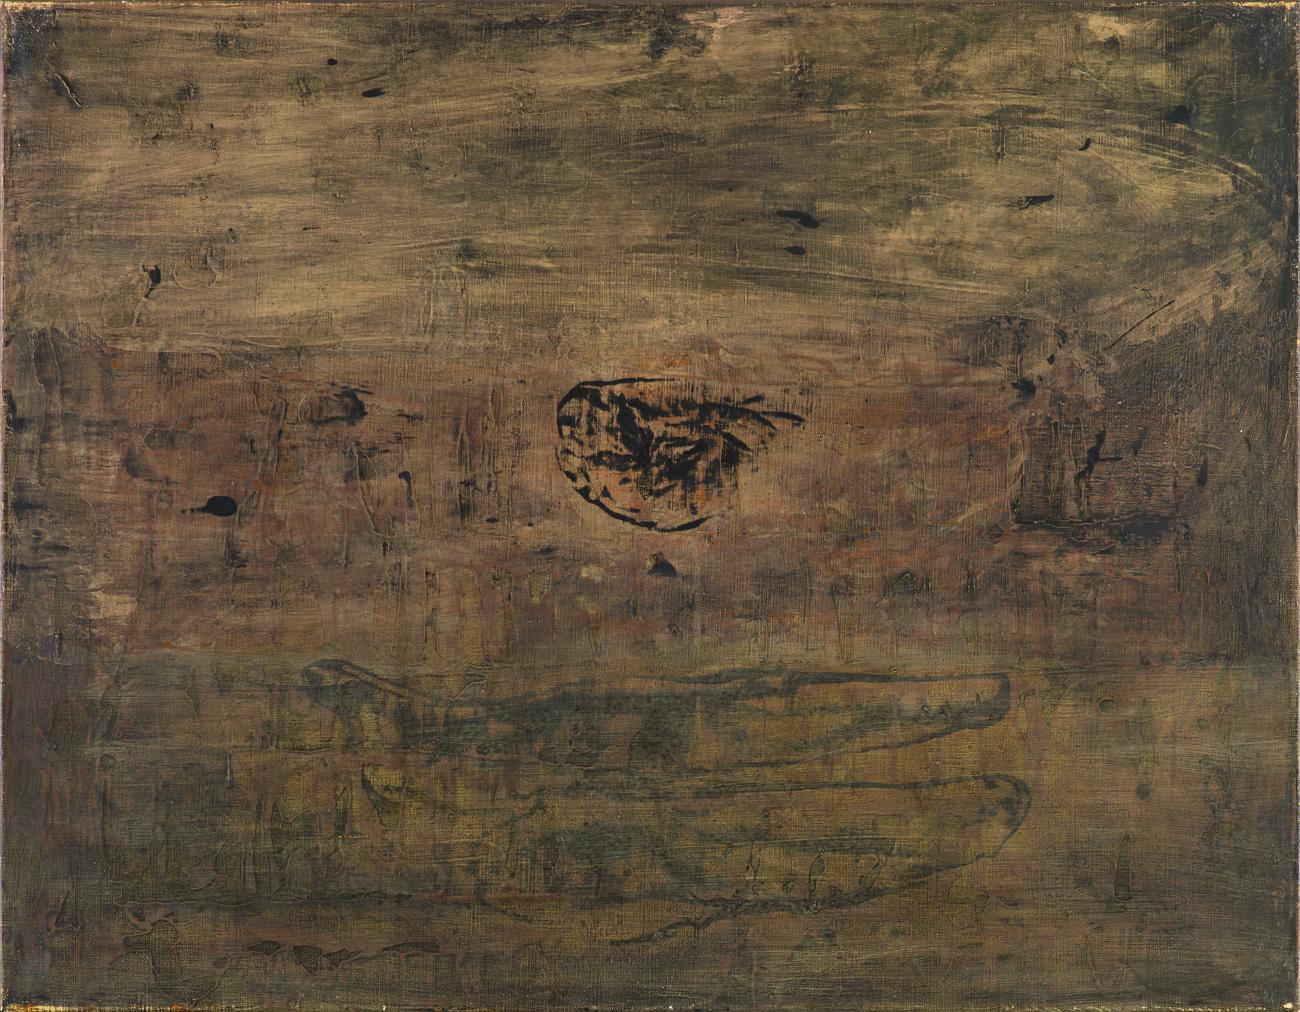 Olav Christopher Jenssen  Untitled  1989 Oil on canvas 70 x 90 cm